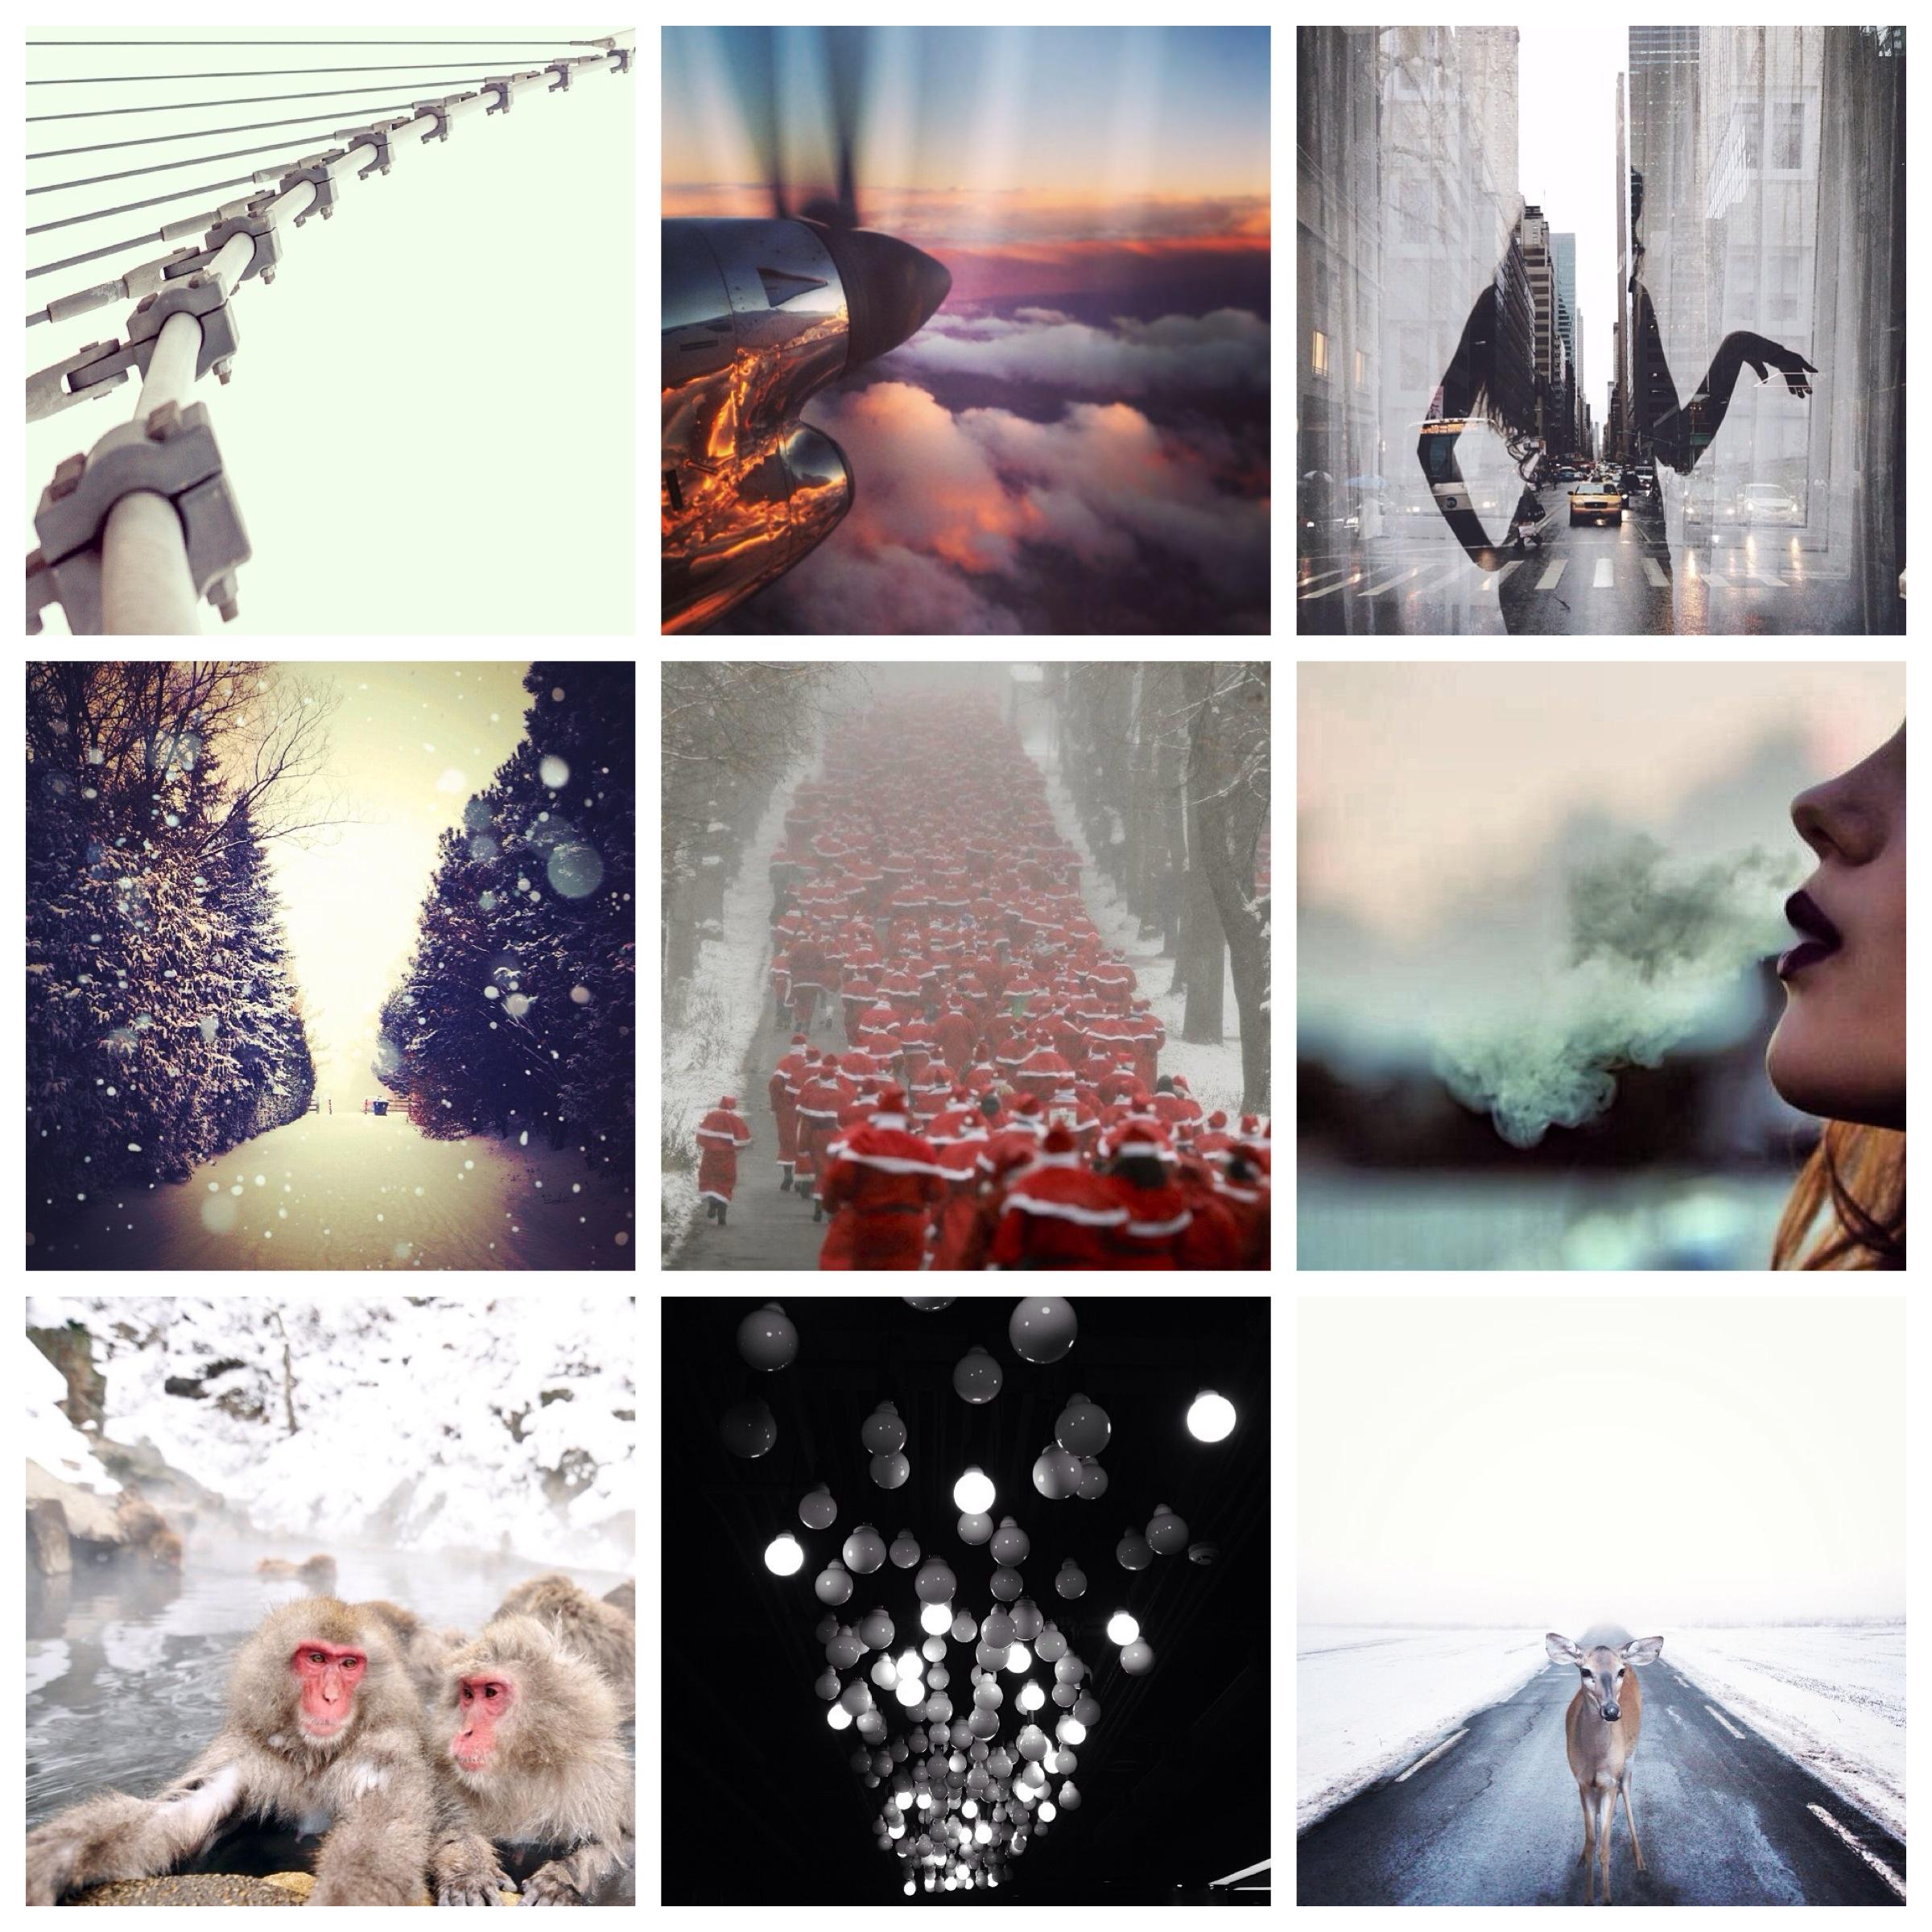 Instagram, instagallery, curated gallery, http://wetravelandblog.com